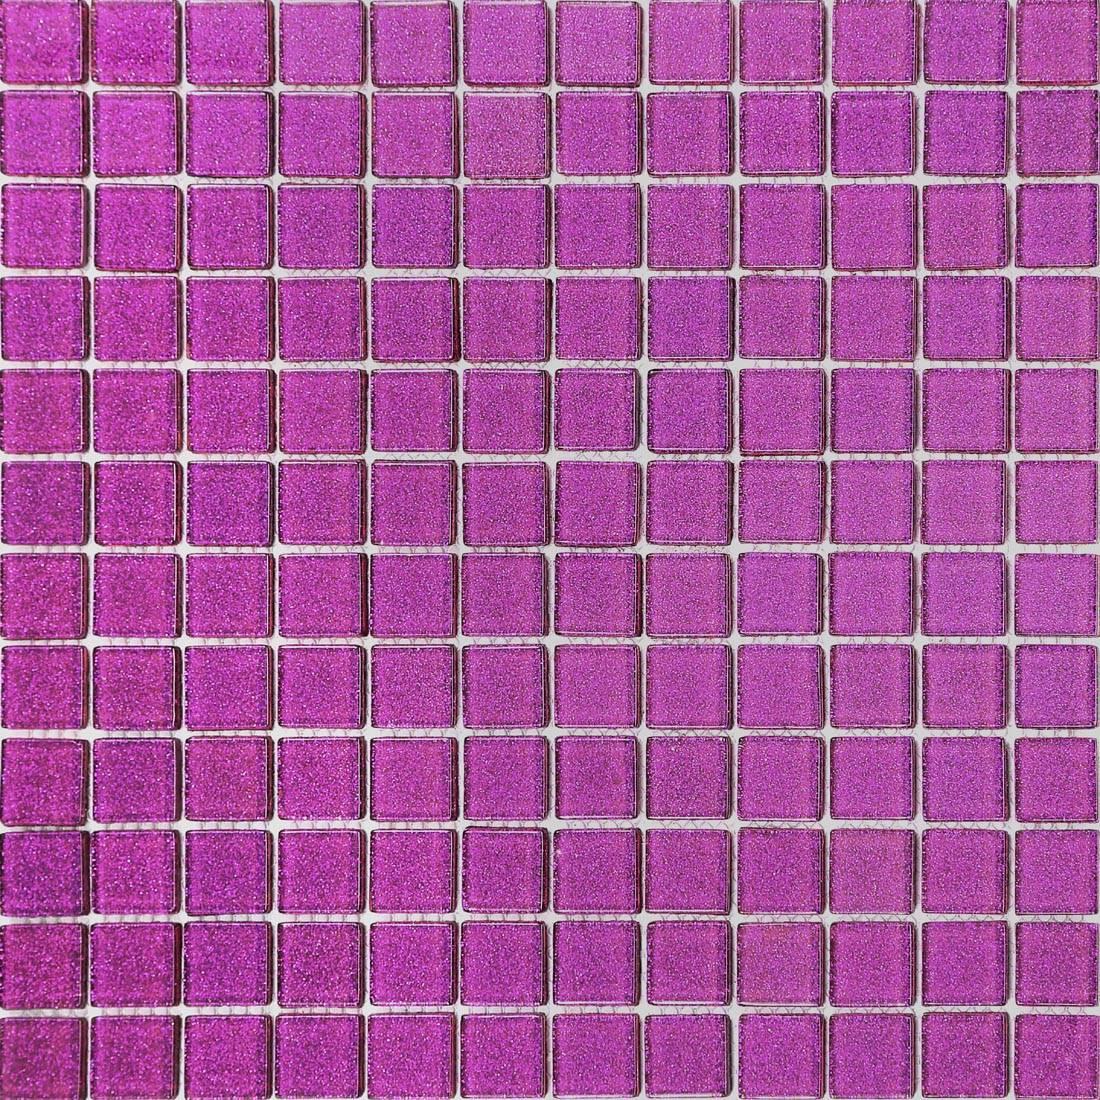 Trade Budget Glitter Mosaic Tile Sheets Glass Bathroom Borders Splashback Tiles